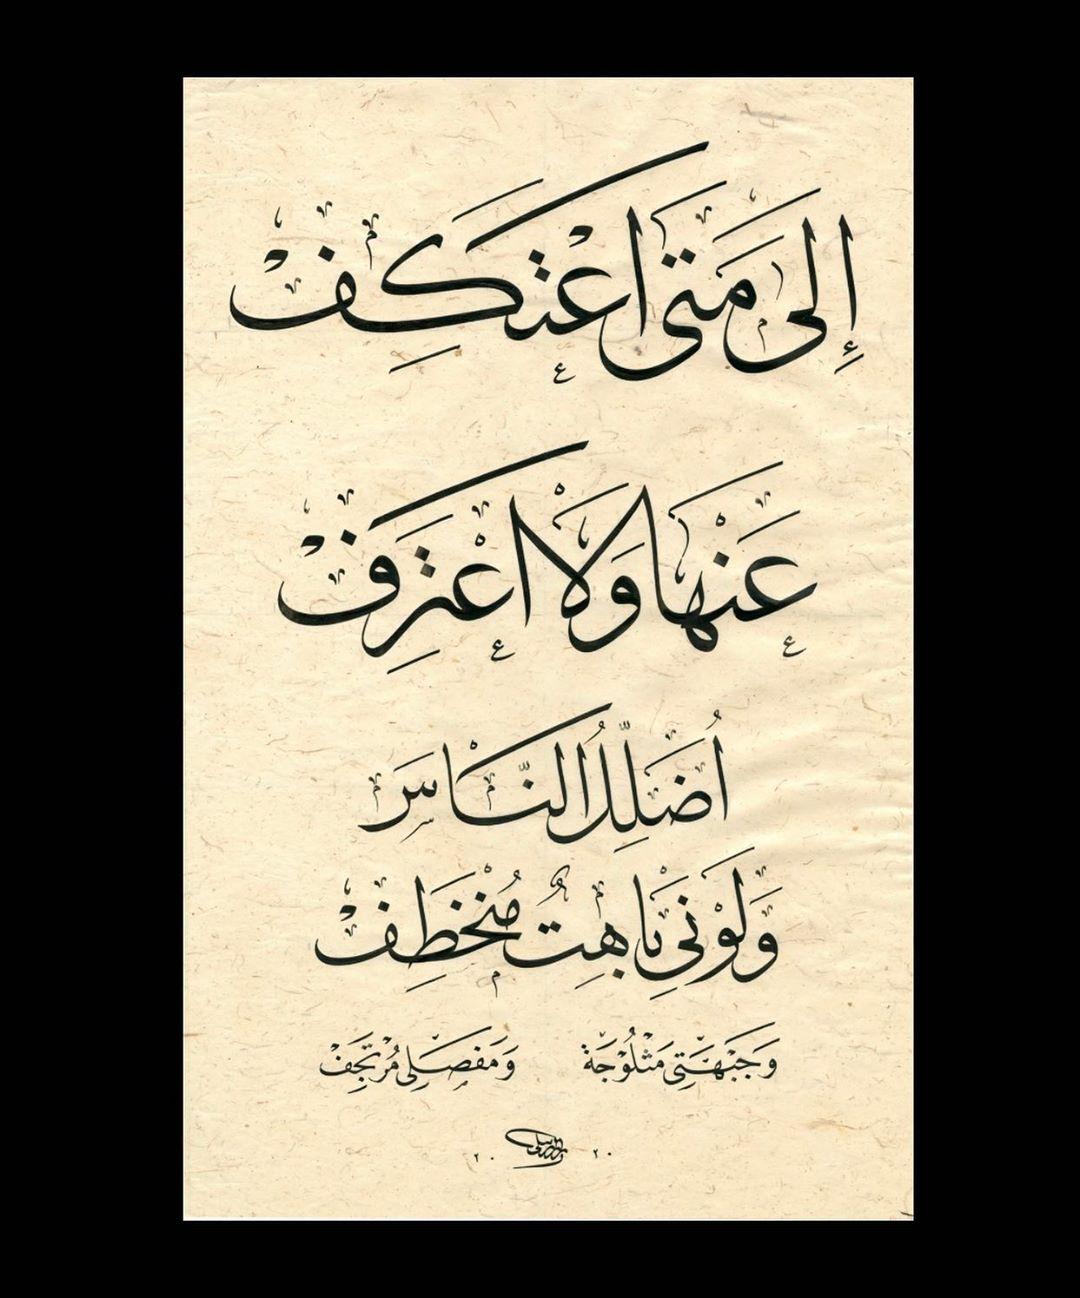 Professional Calligrapher Bijar Arbilly Calligraphy  اسعد الله صباحكم احبائي… من اعترافات الروائعة لنزار قباني #calligraphy #kunst … 452